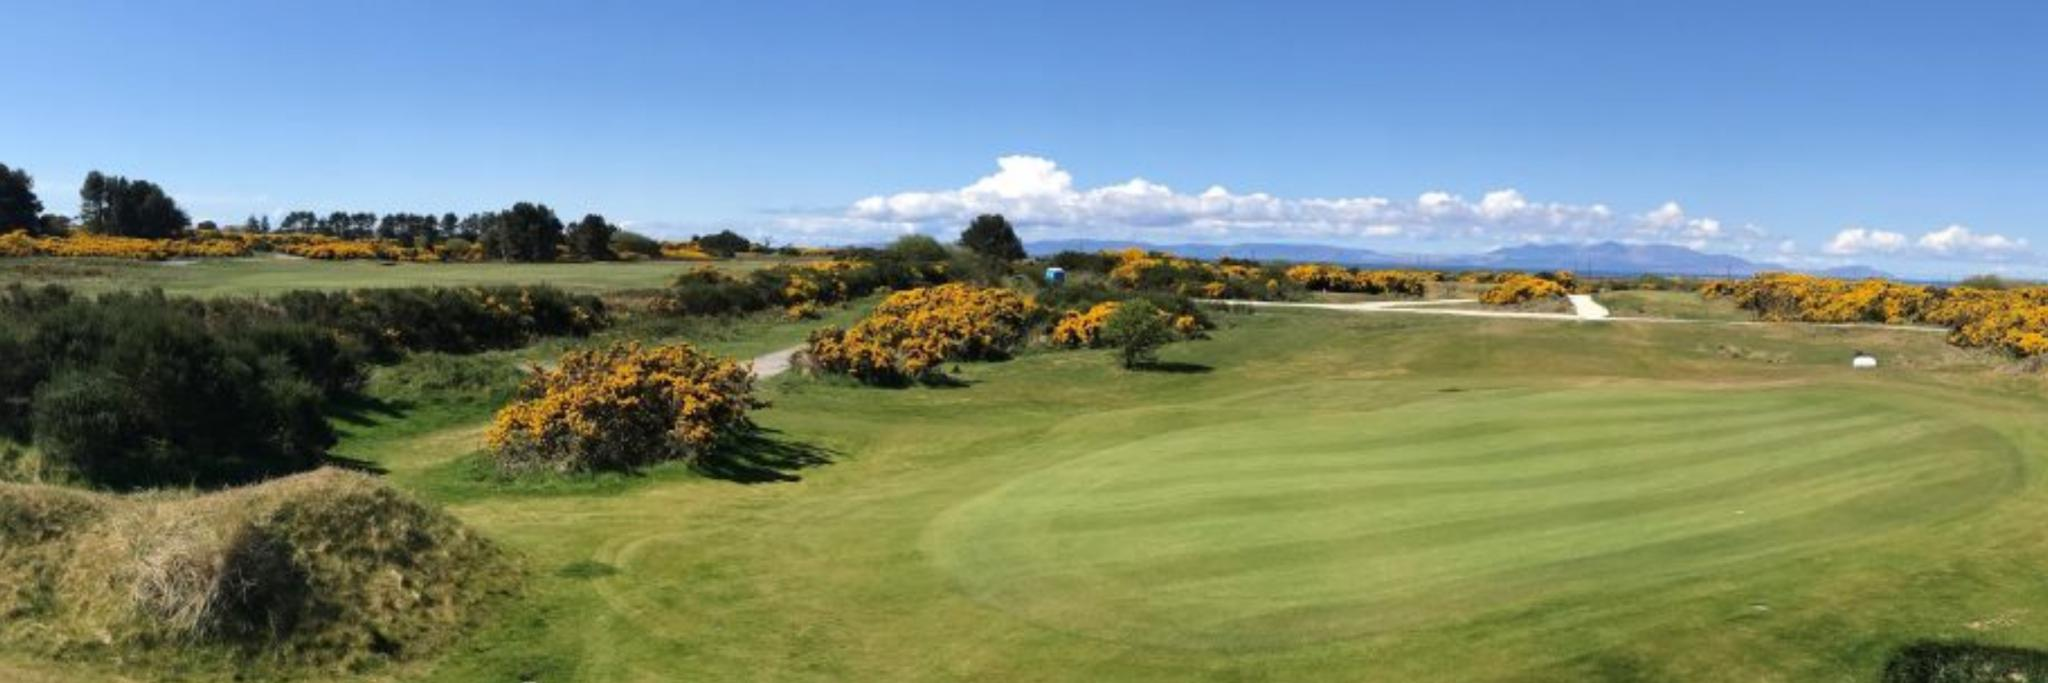 Golf in Ayrshire